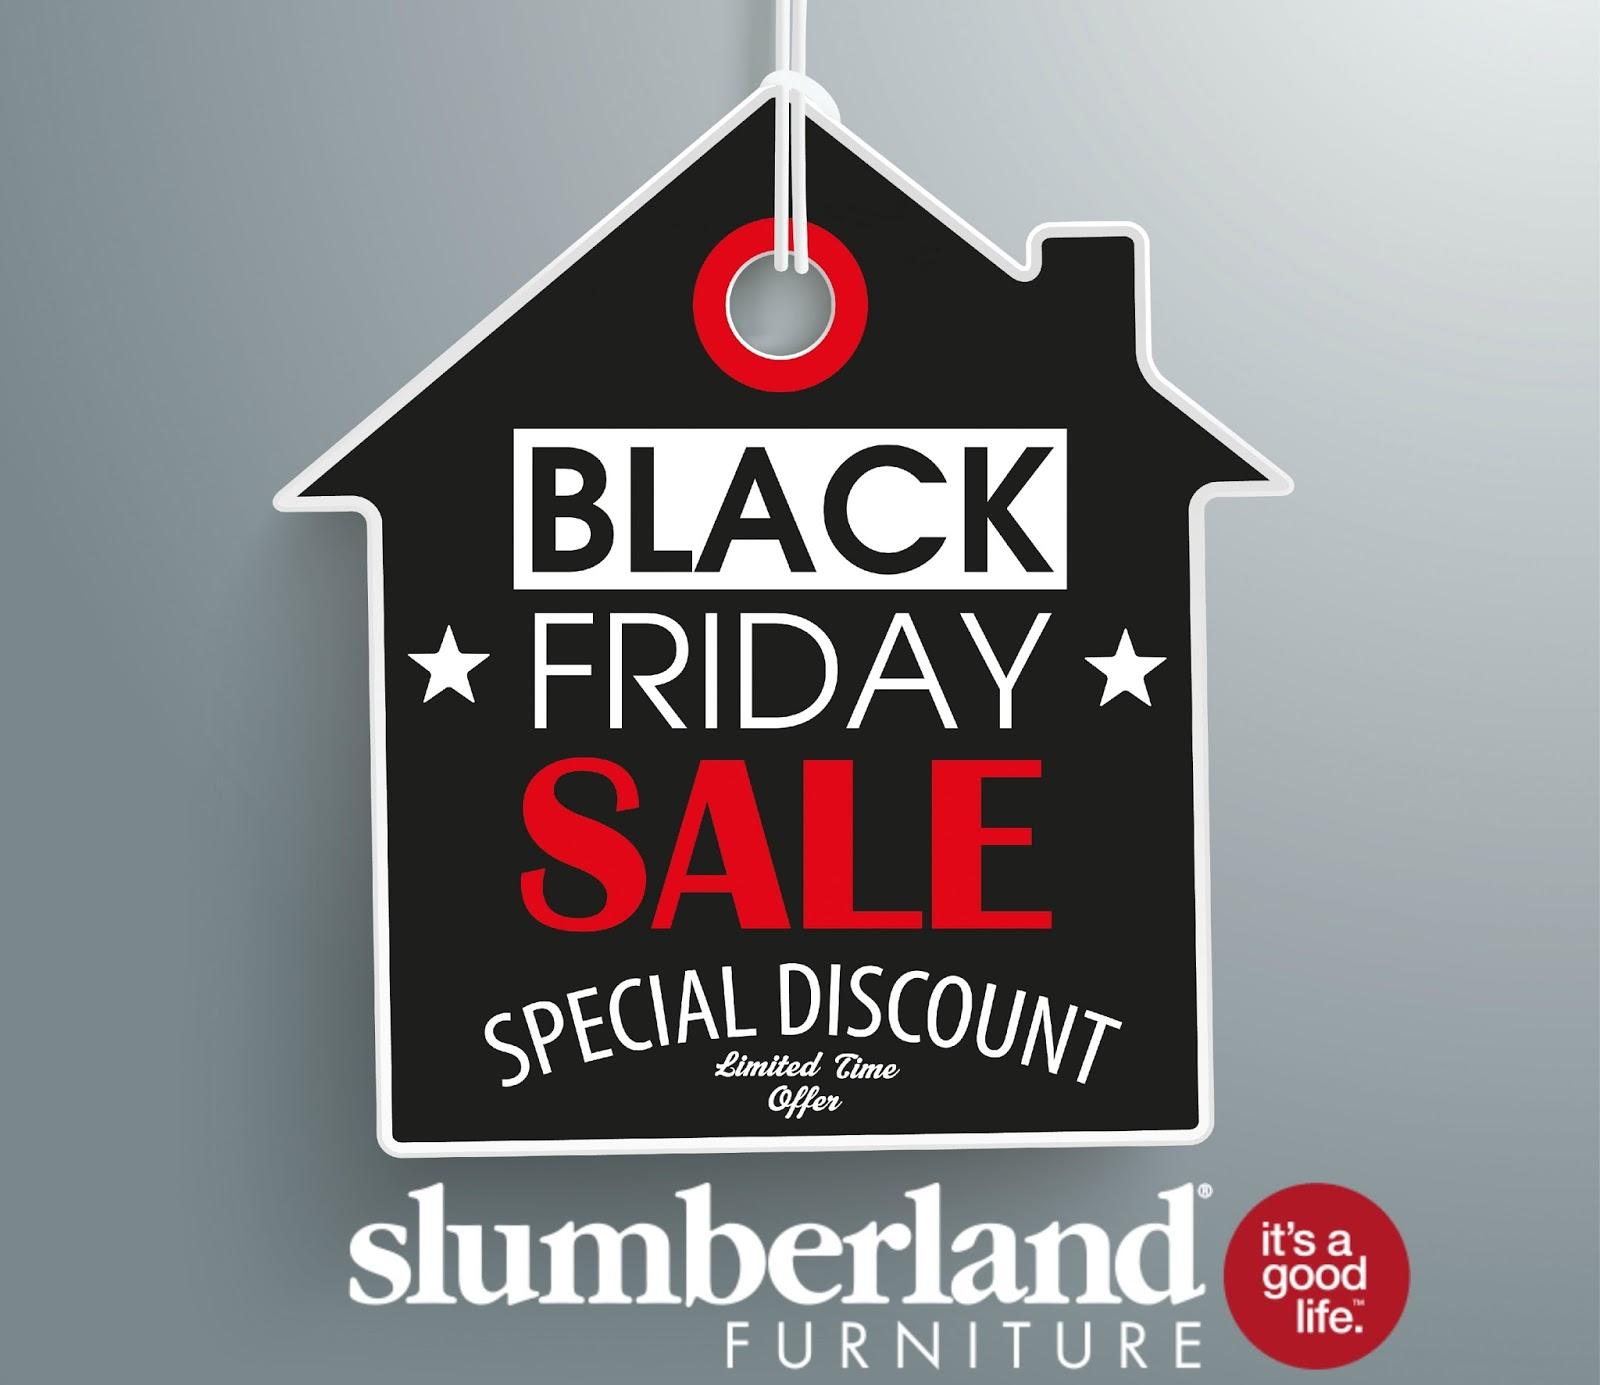 Slumberland Furnitureu0027s Incredible Black Friday Deals!